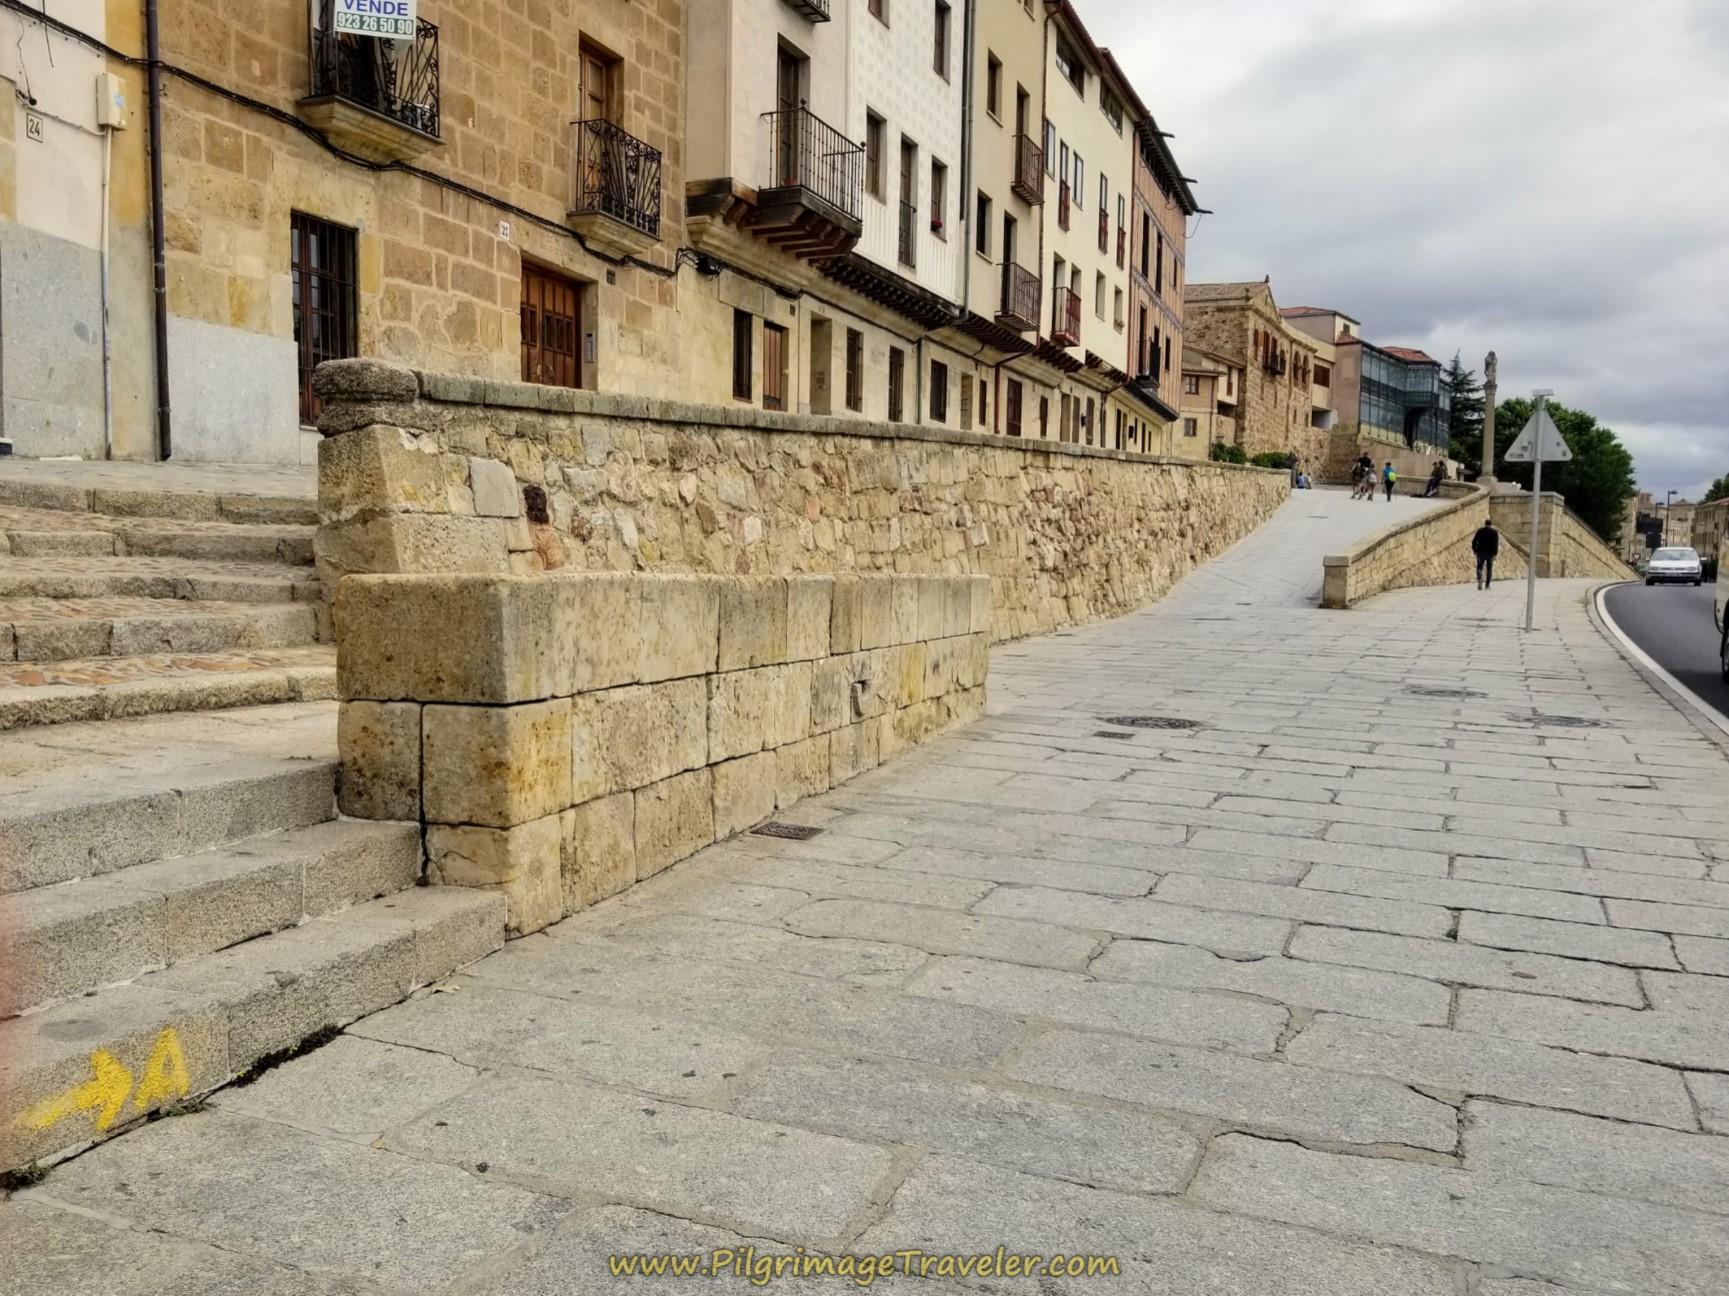 Left Turn Onto Calle Ribera del Puente